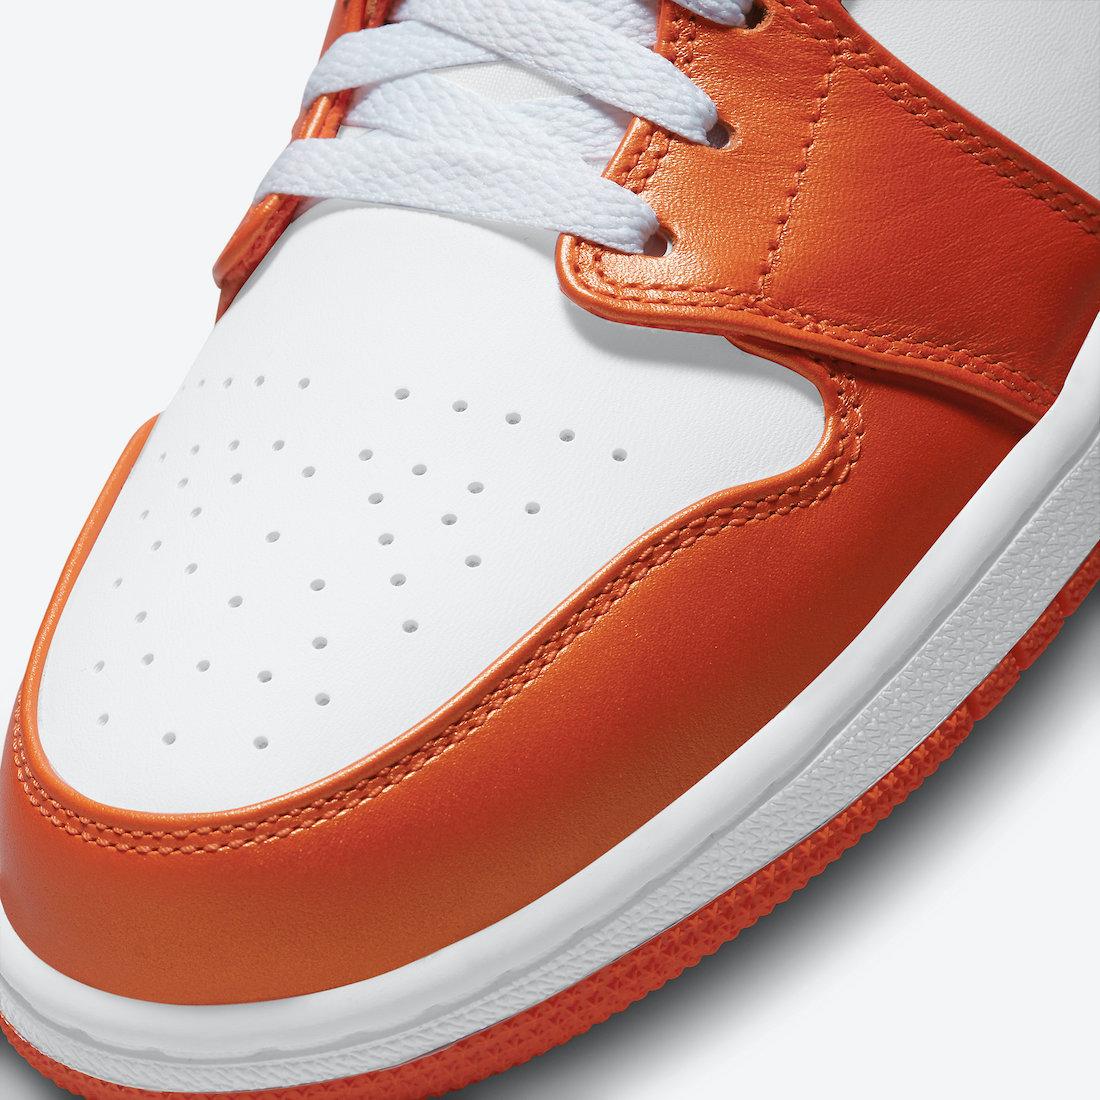 Air-Jordan-1-Mid-White-Orange-DM3531-800-Release-Date-6